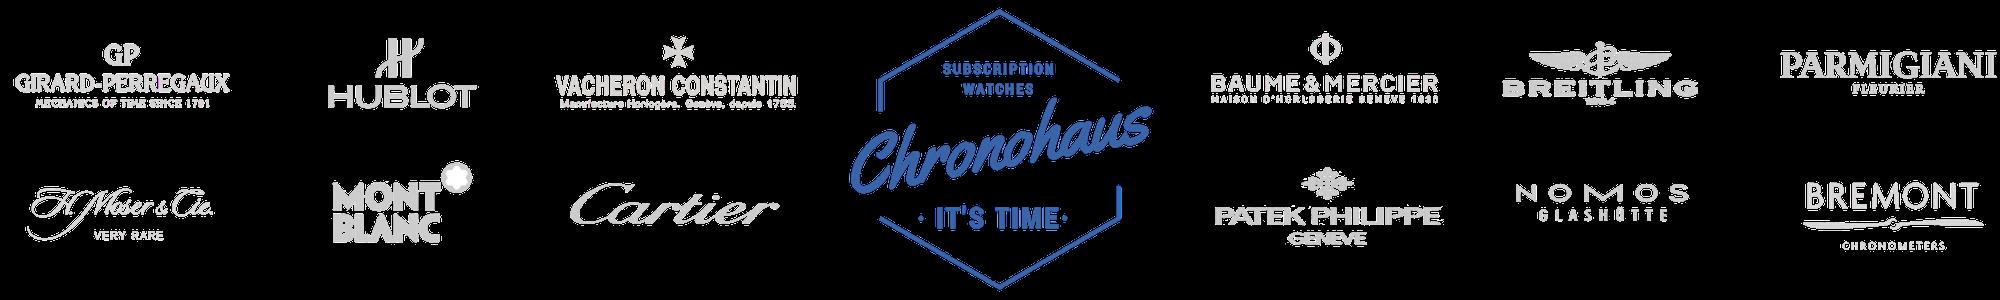 chronohaus-d-blue-brand-banner-iii